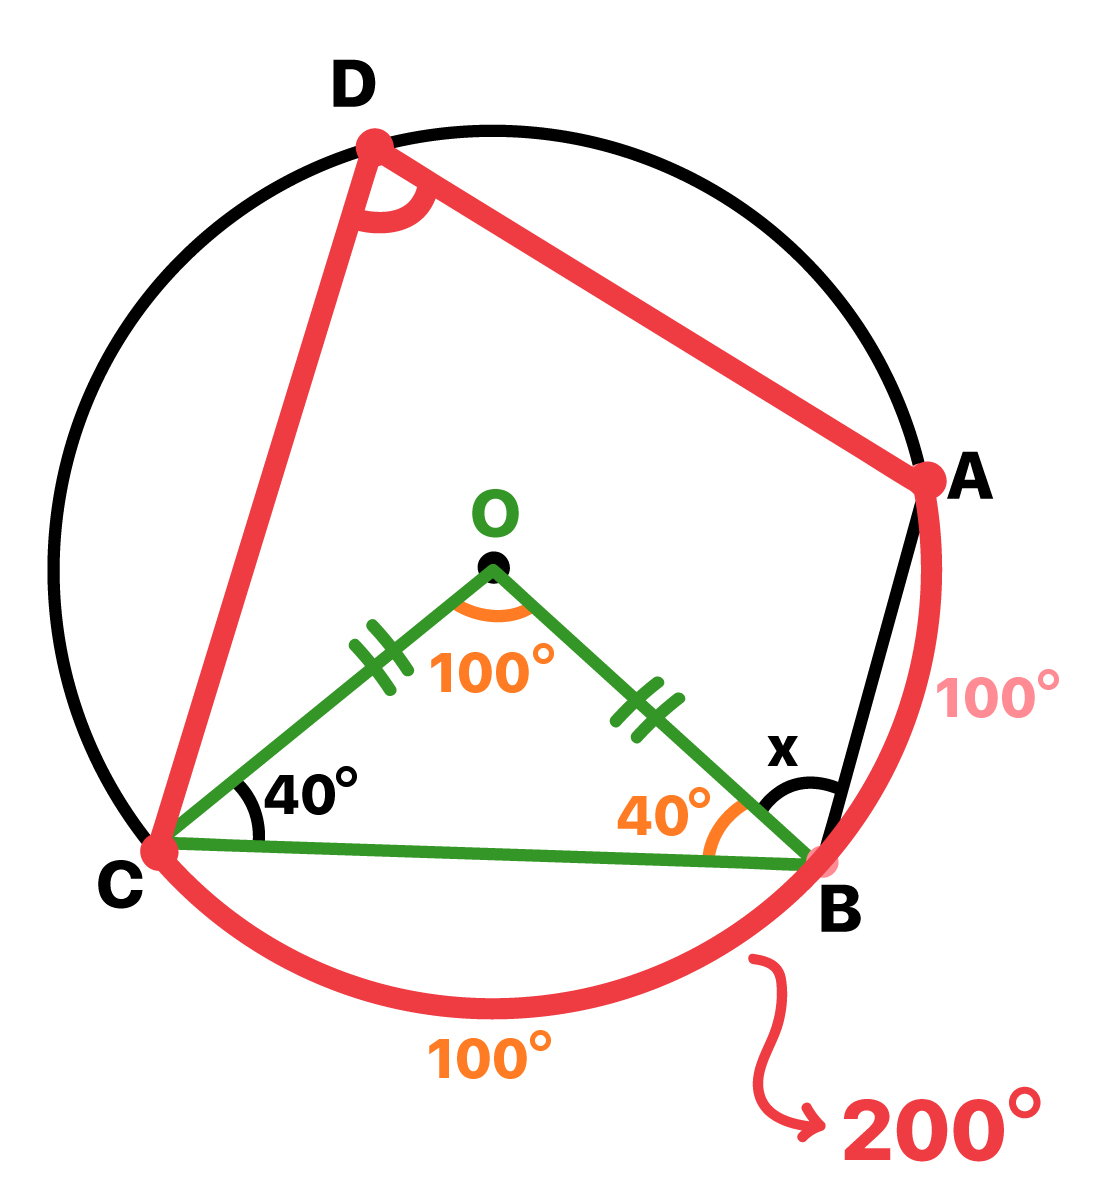 Ângulo inscrito de vértice D possui arco correspondente de 200 graus